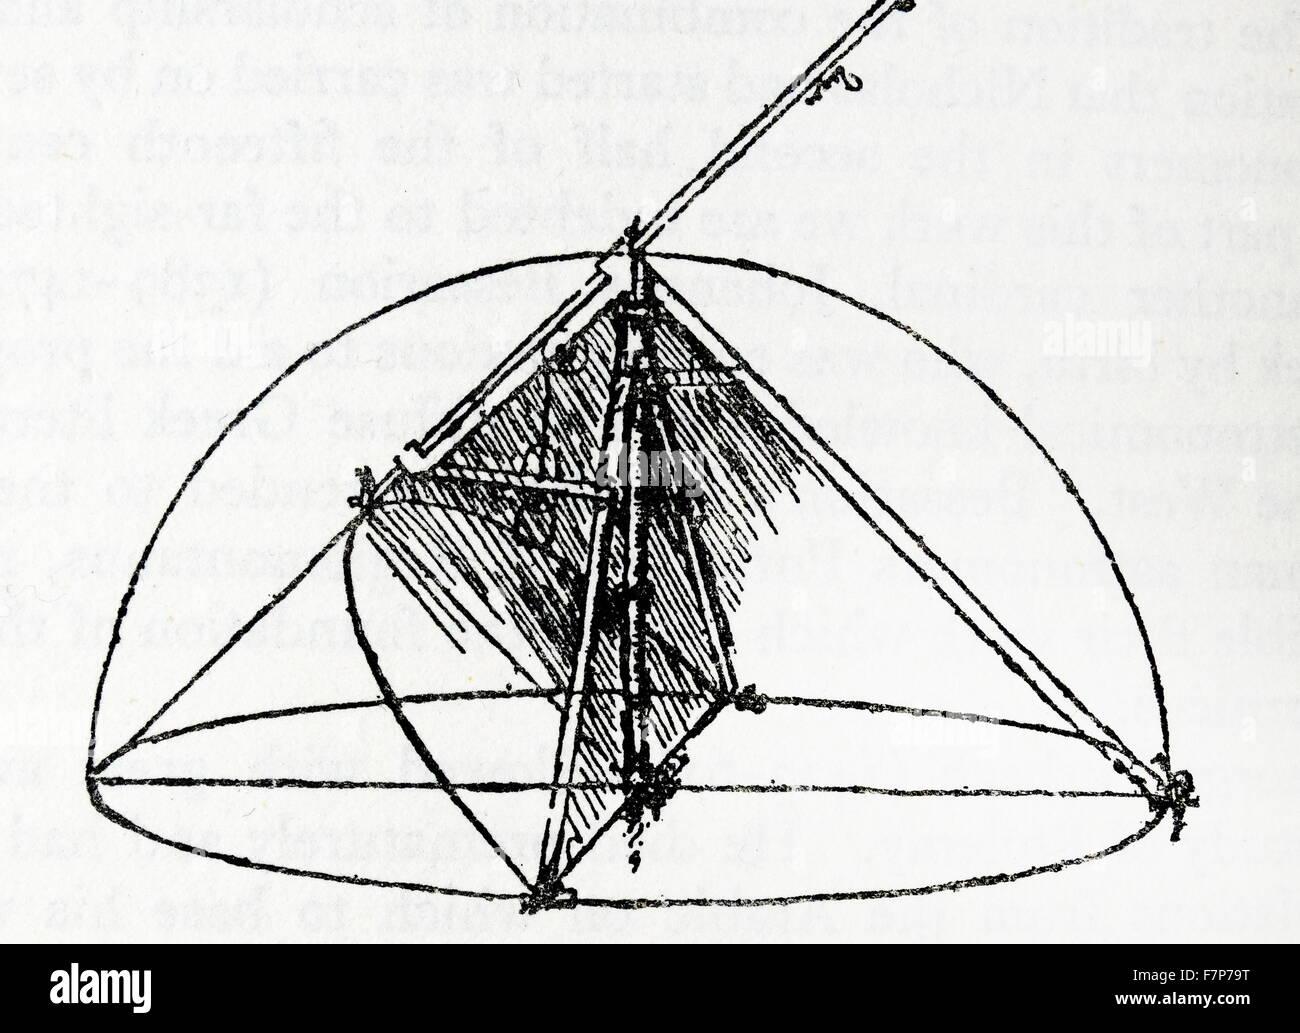 Parabolic Cinoass Leonardo da Vinci - Stock Image